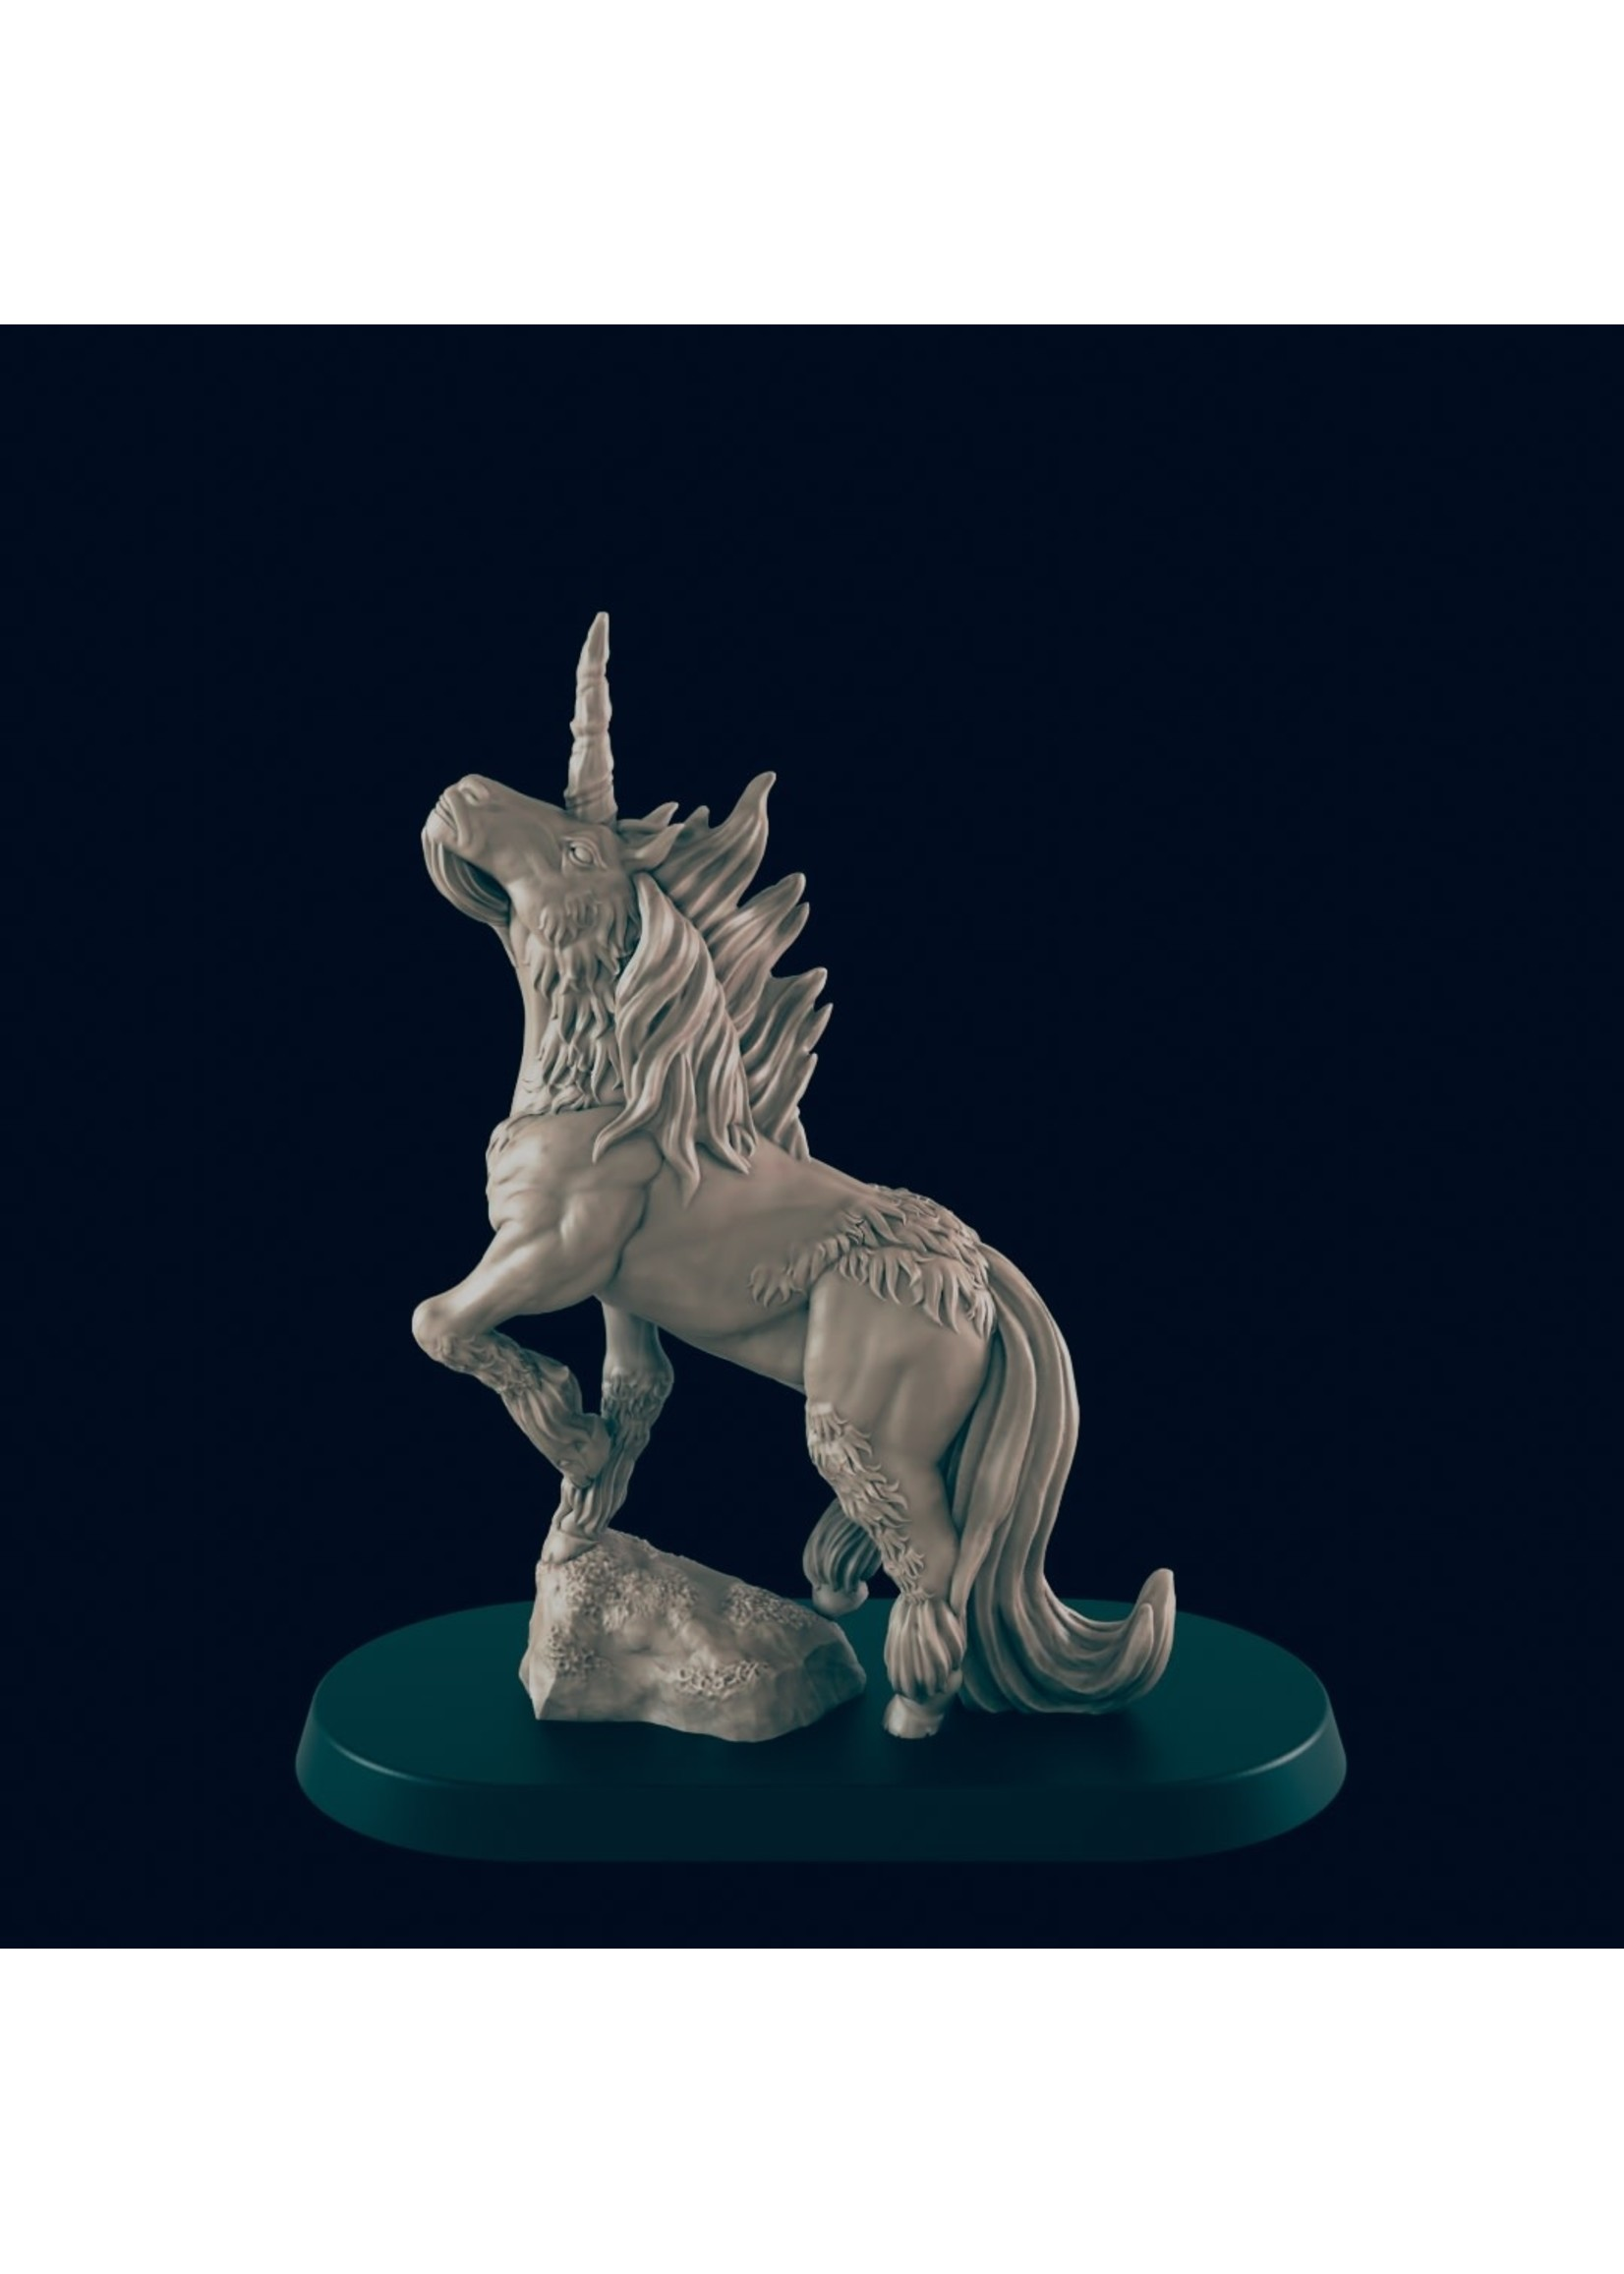 3D Printed Miniature - Unicorn - Dungeons & Dragons - Beasts and Baddies KS